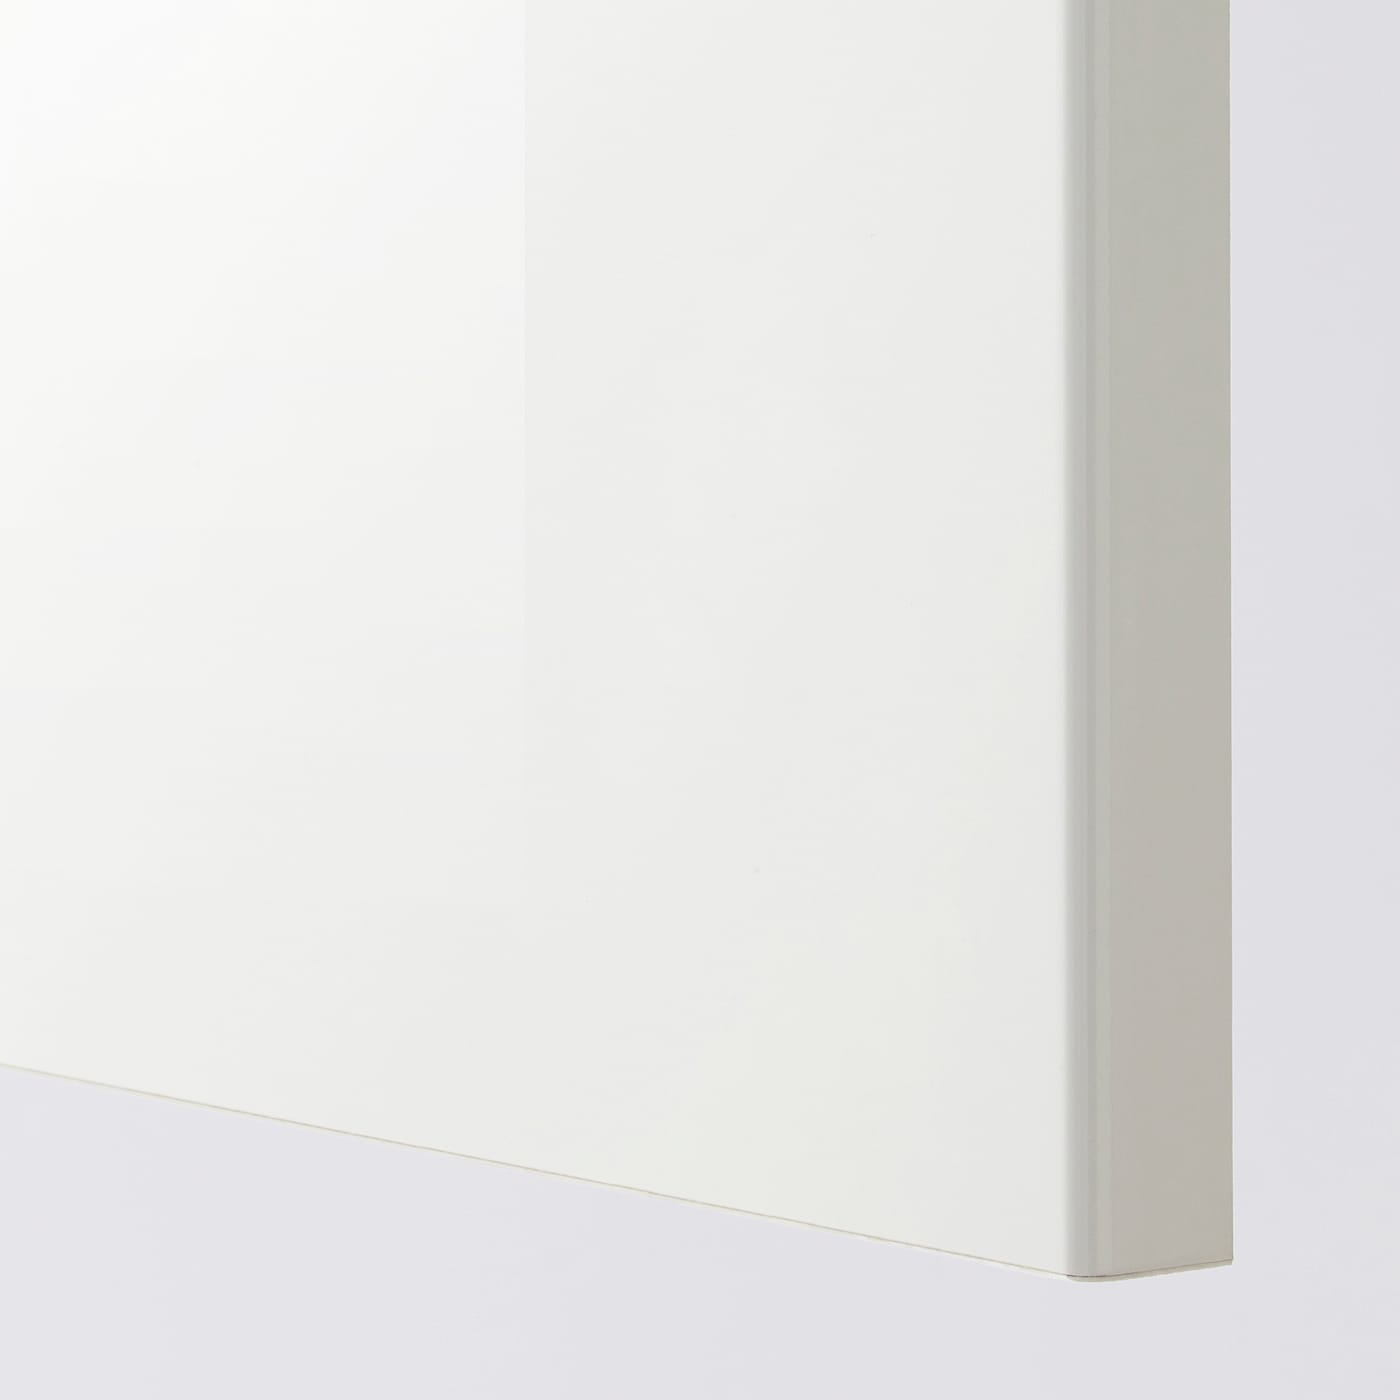 Porte Laque Blanc Ikea ringhult porte - brillant blanc 40x80 cm